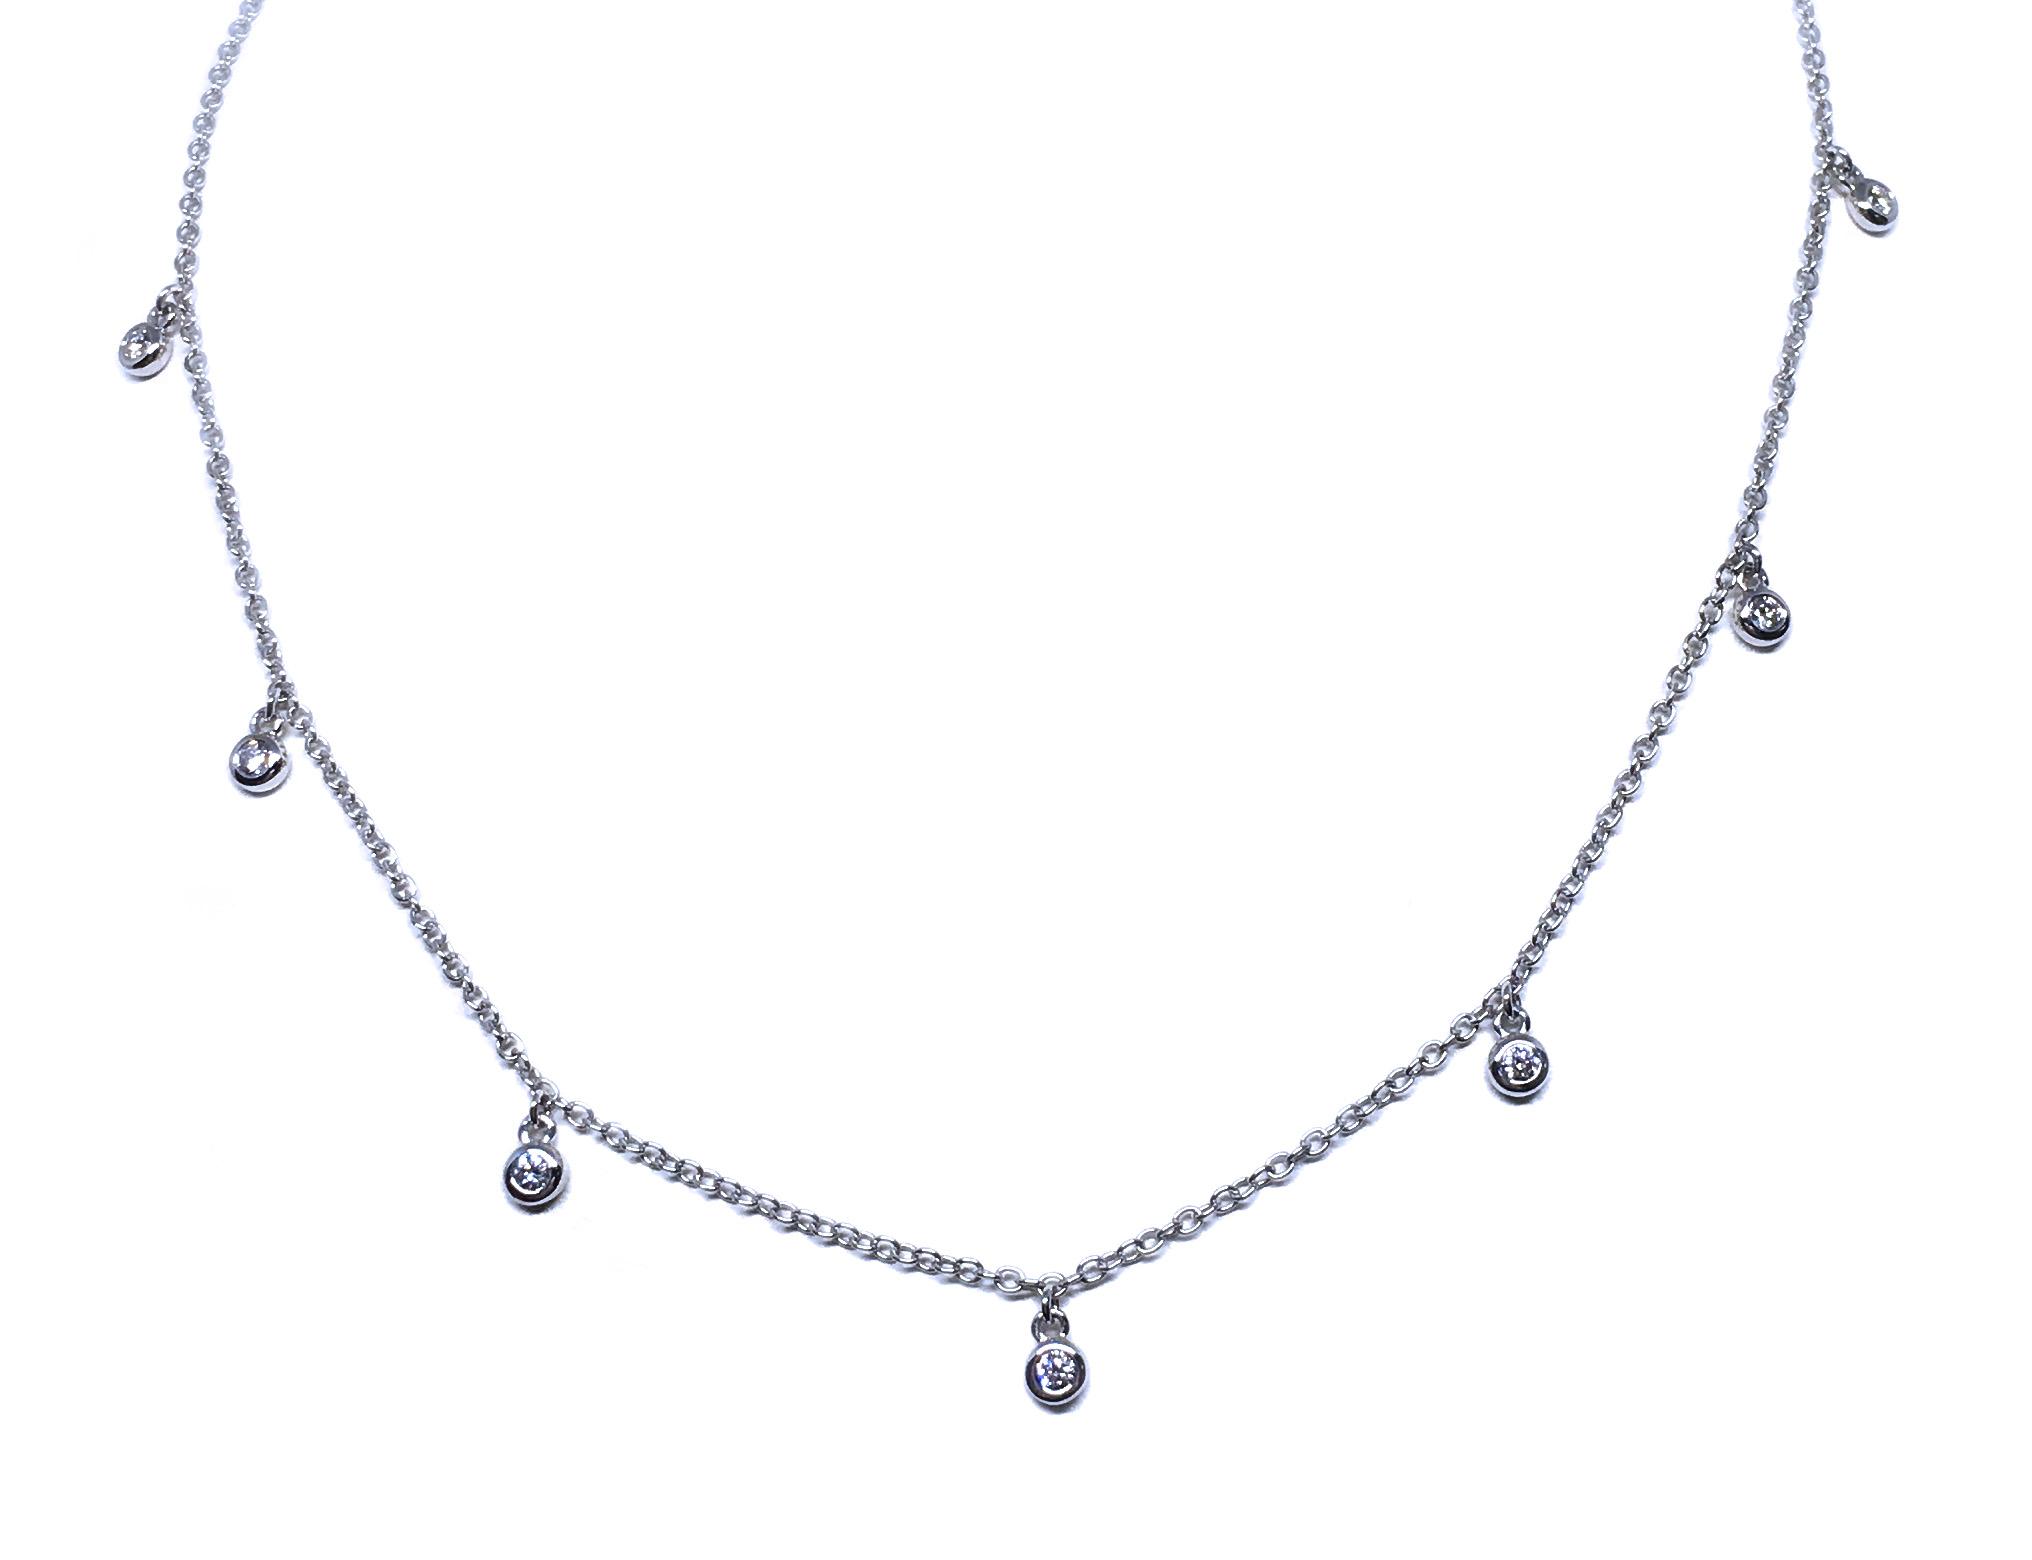 14K White Gold Diamond Drops Necklace